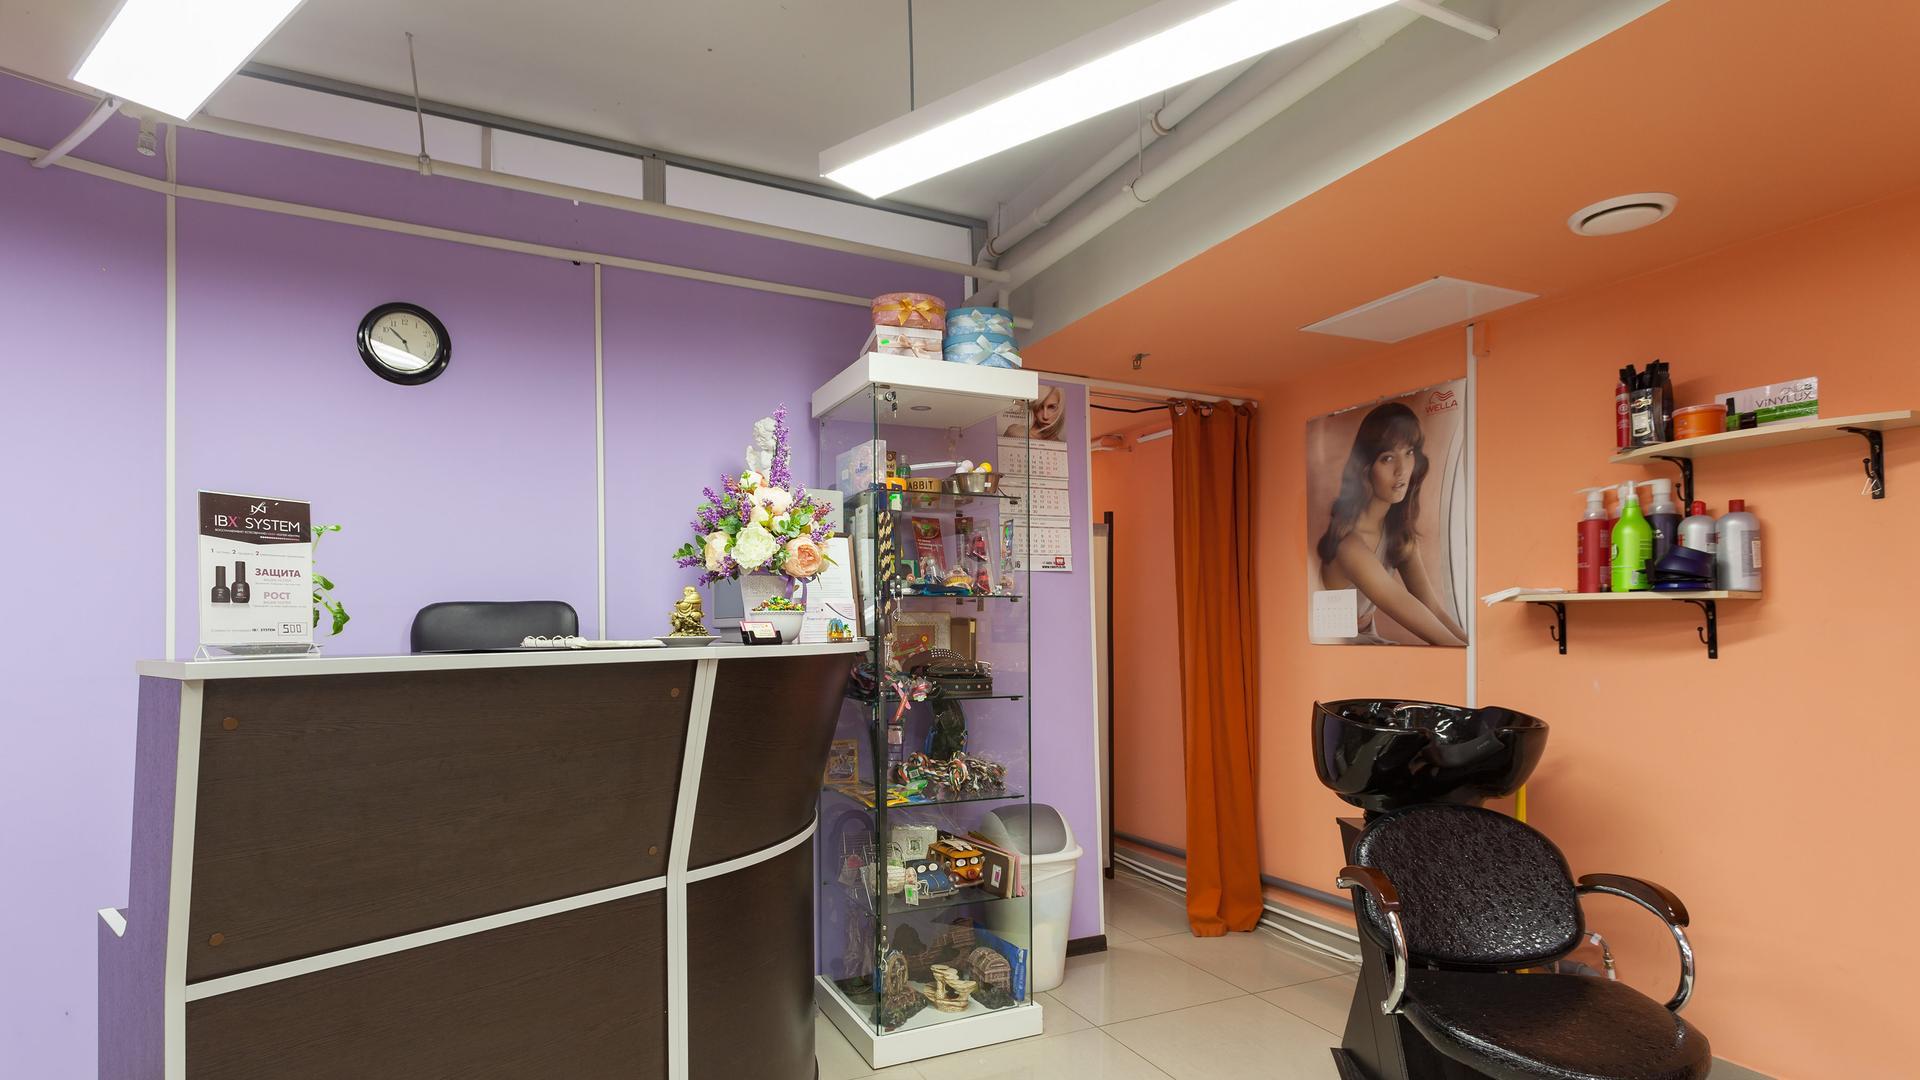 Салон интимного массажа ул академика янгеля 11 фотография